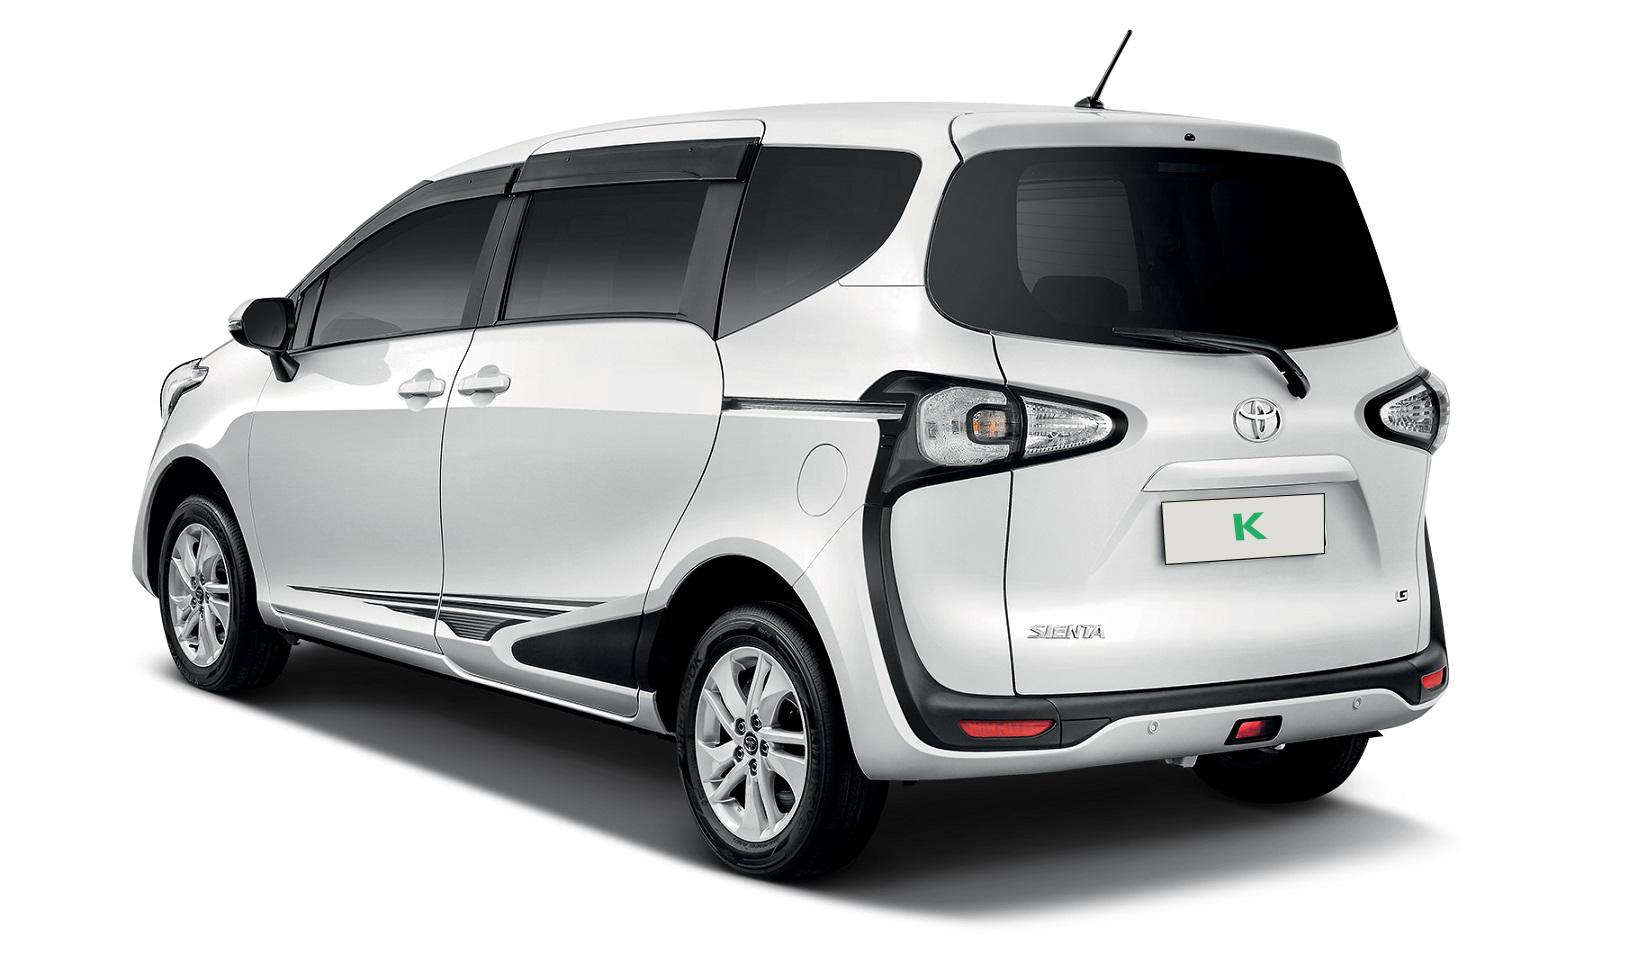 Kekurangan Toyota Sienta 2019 Tangguh